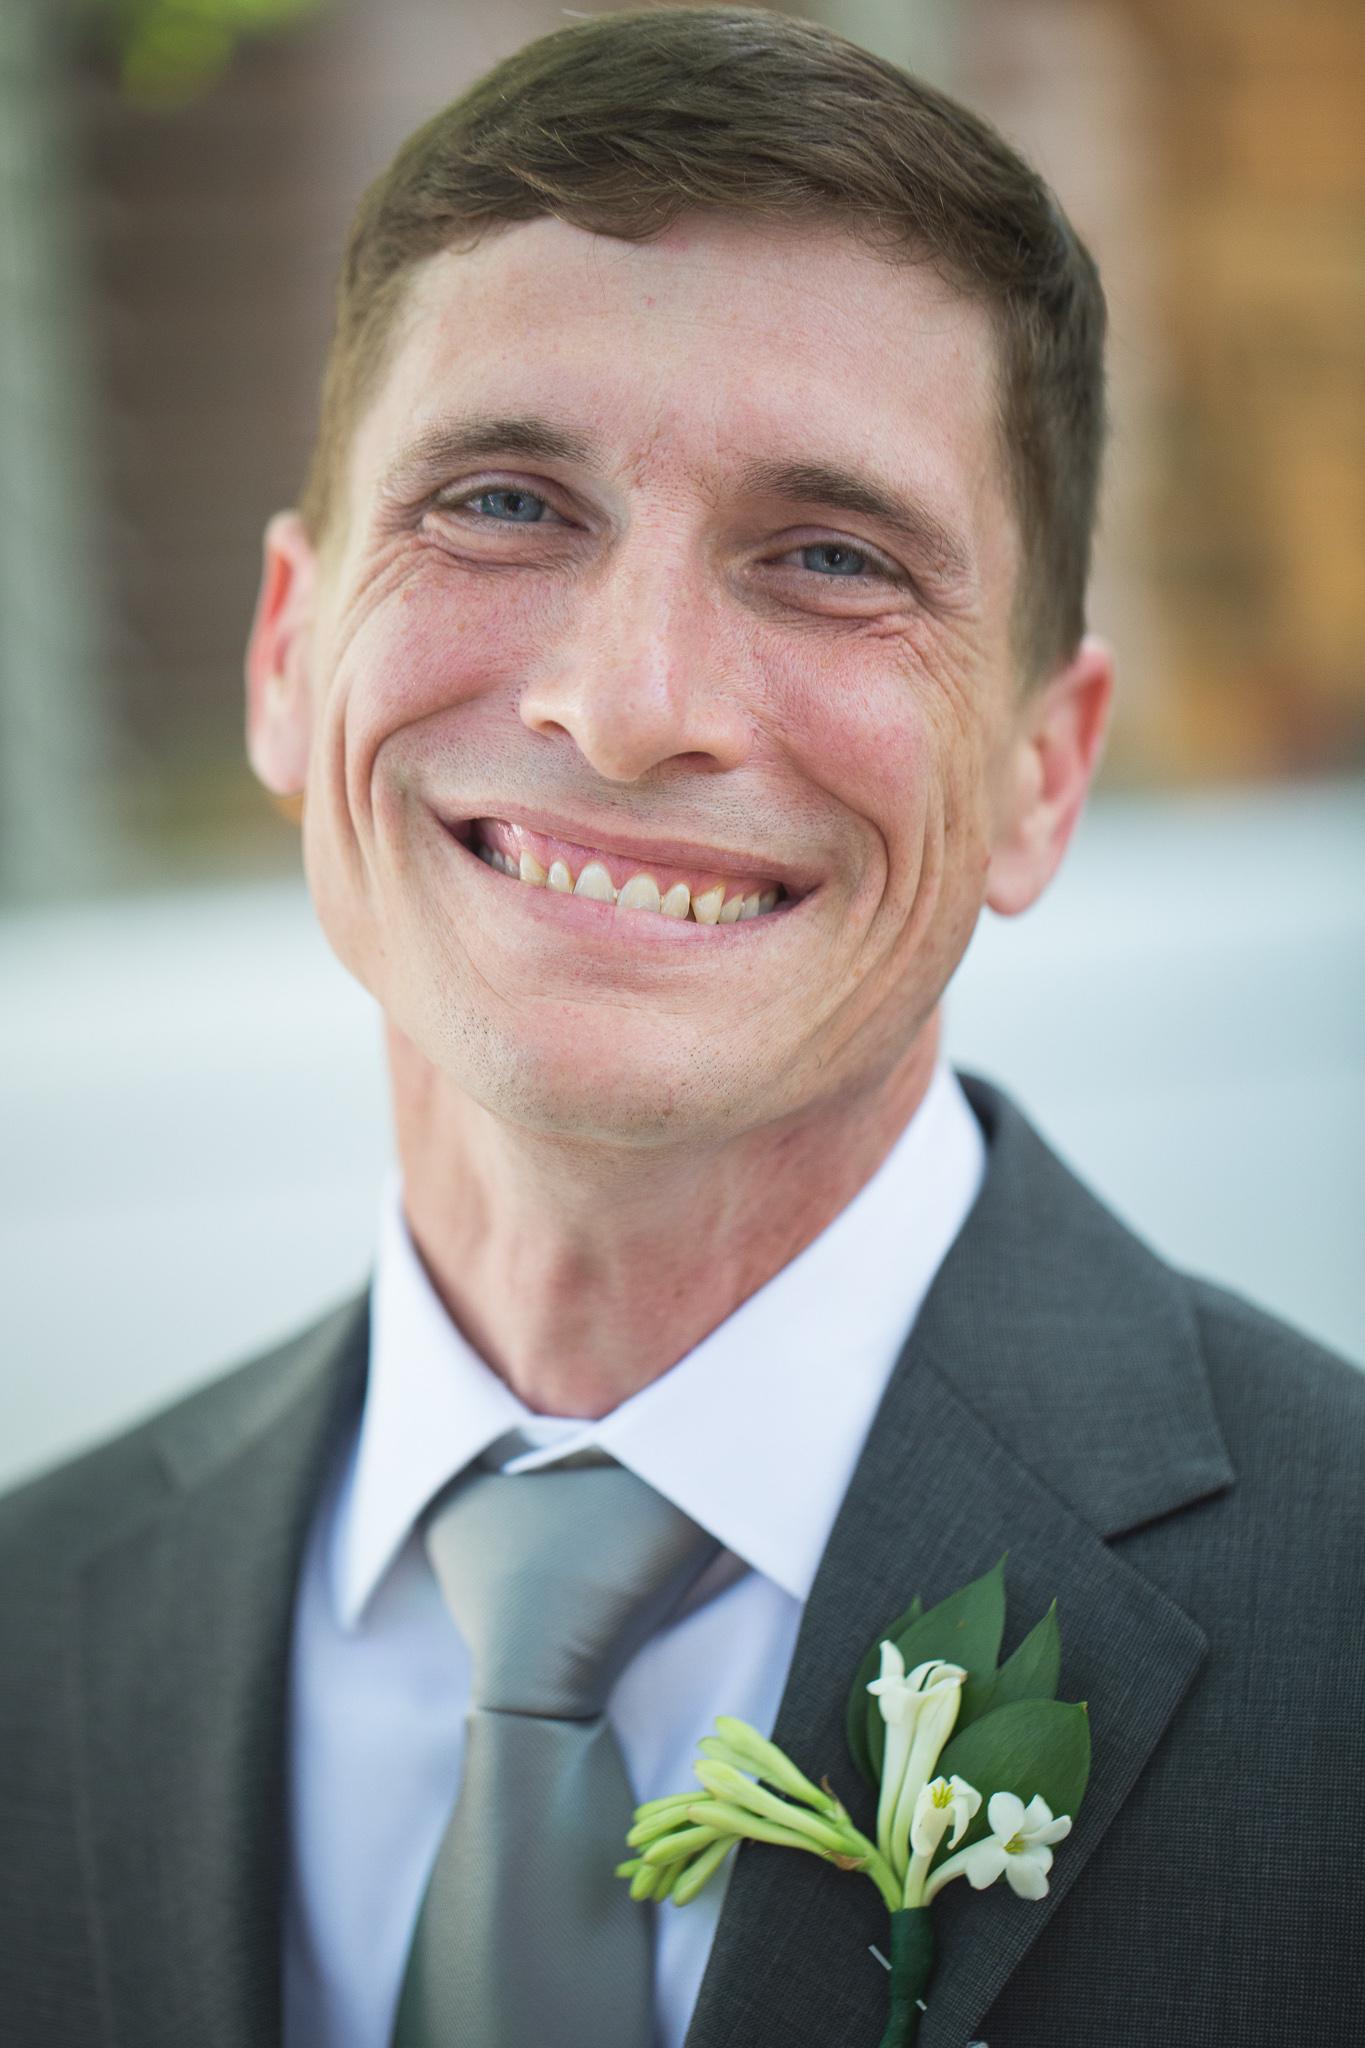 048-best-detroit-michigan-outdoor-destination-wedding-photographer.jpg